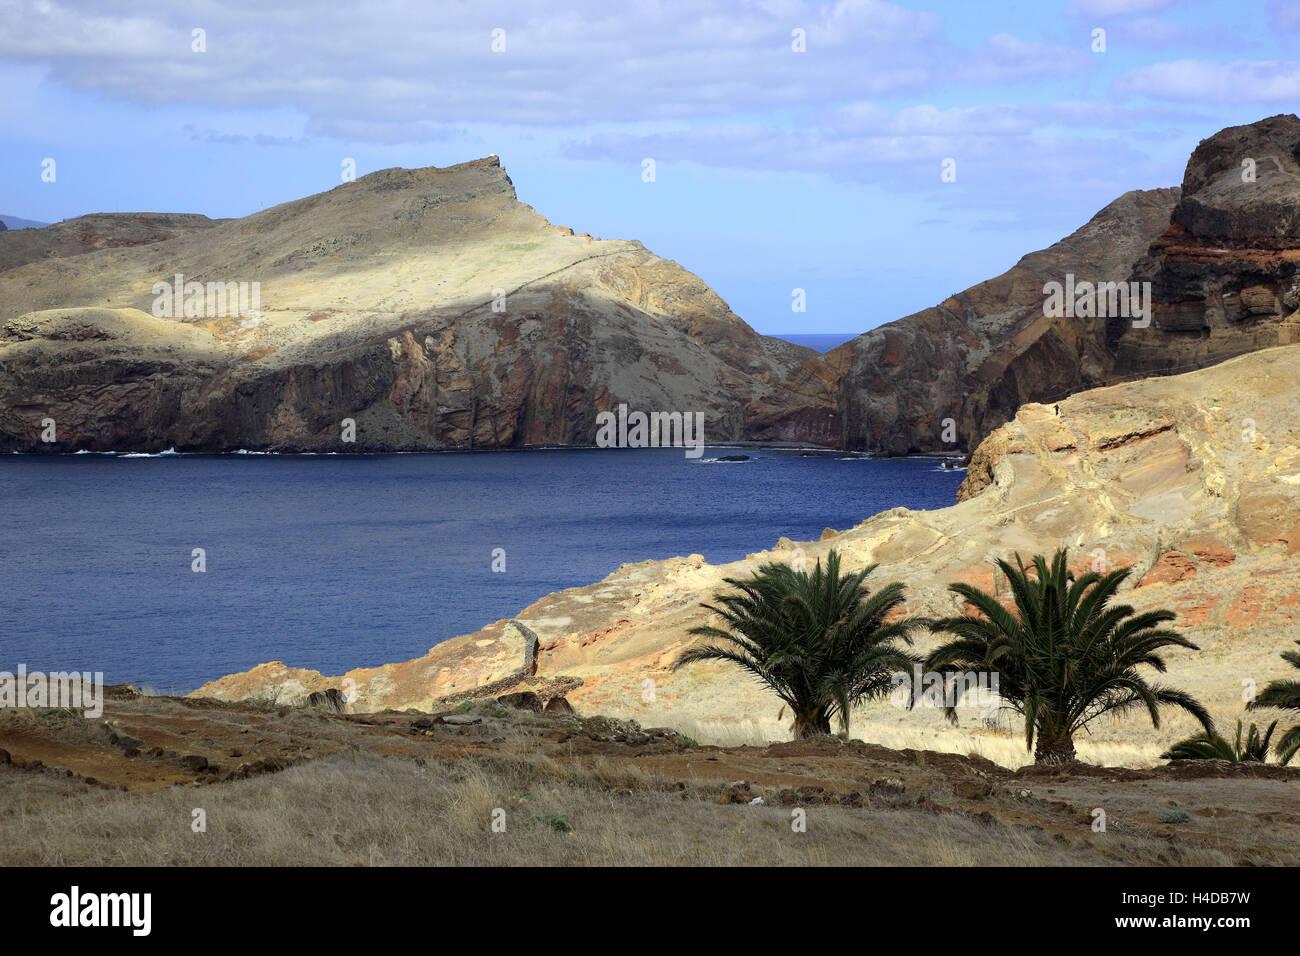 Madeira, in Cap Ponta de Sao Lourenco, scenery at the eastern end the island - Stock Image